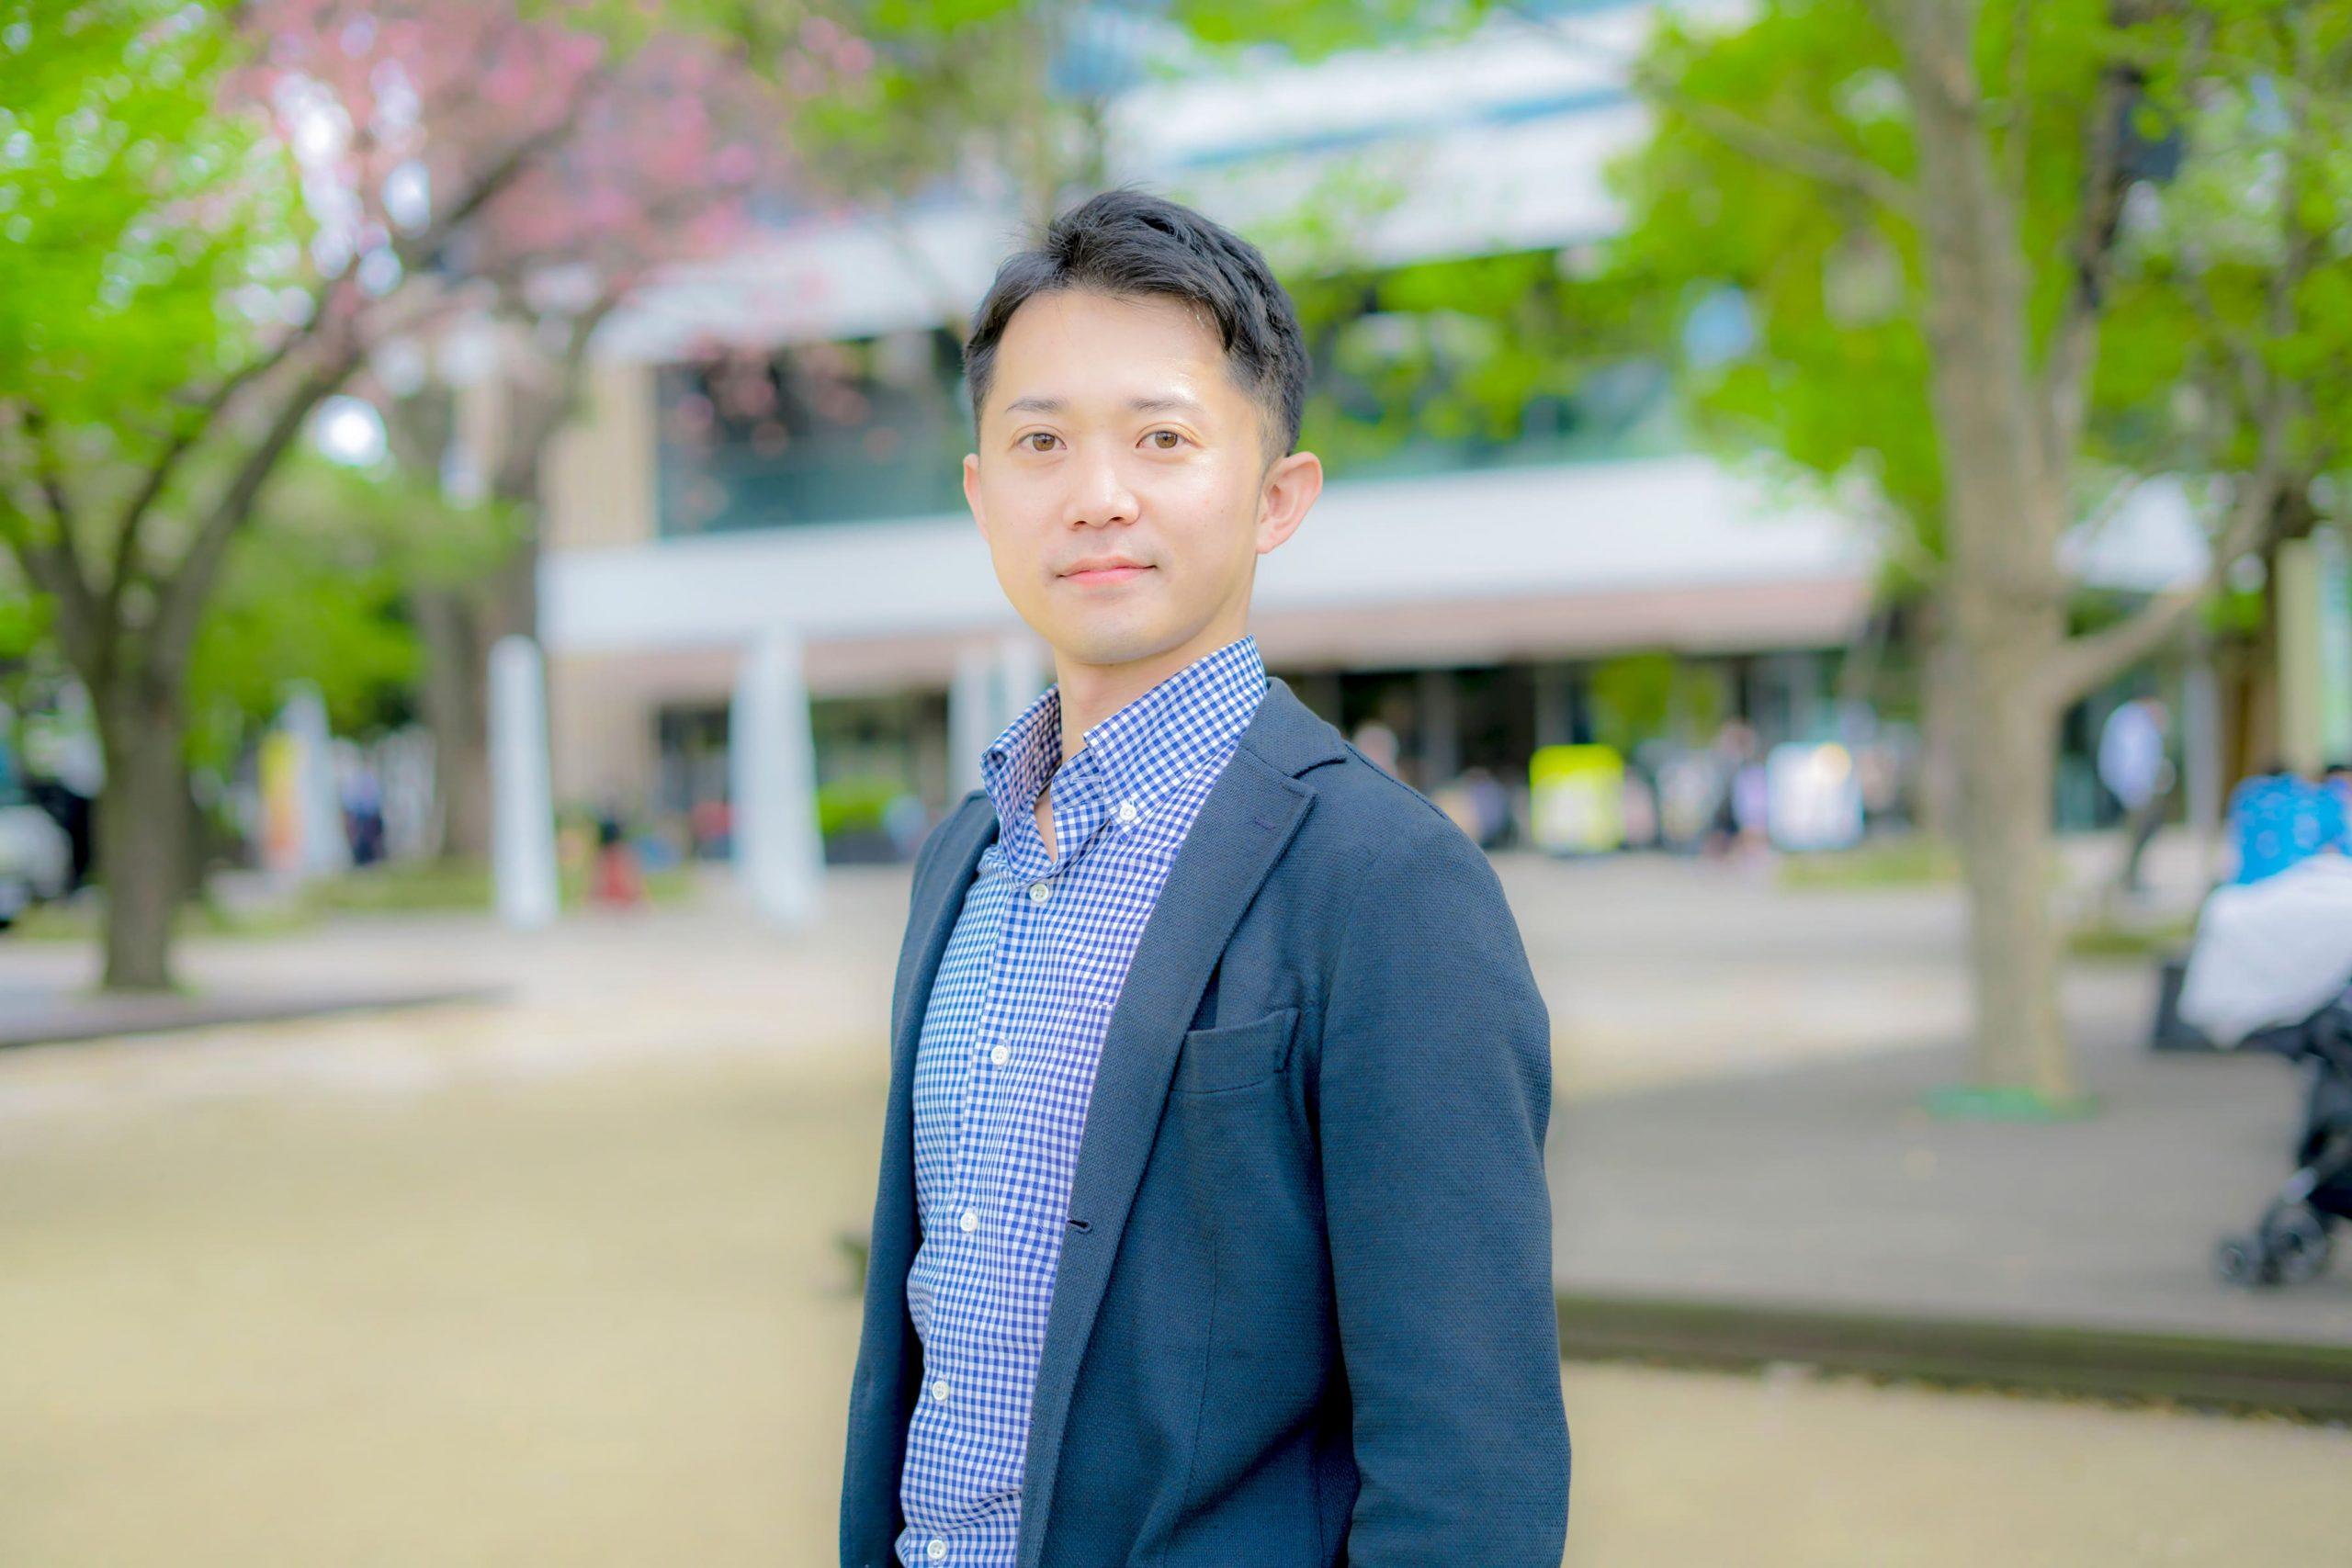 https://academy.precena.co.jp/wp-content/uploads/2021/05/高橋亮-scaled.jpg